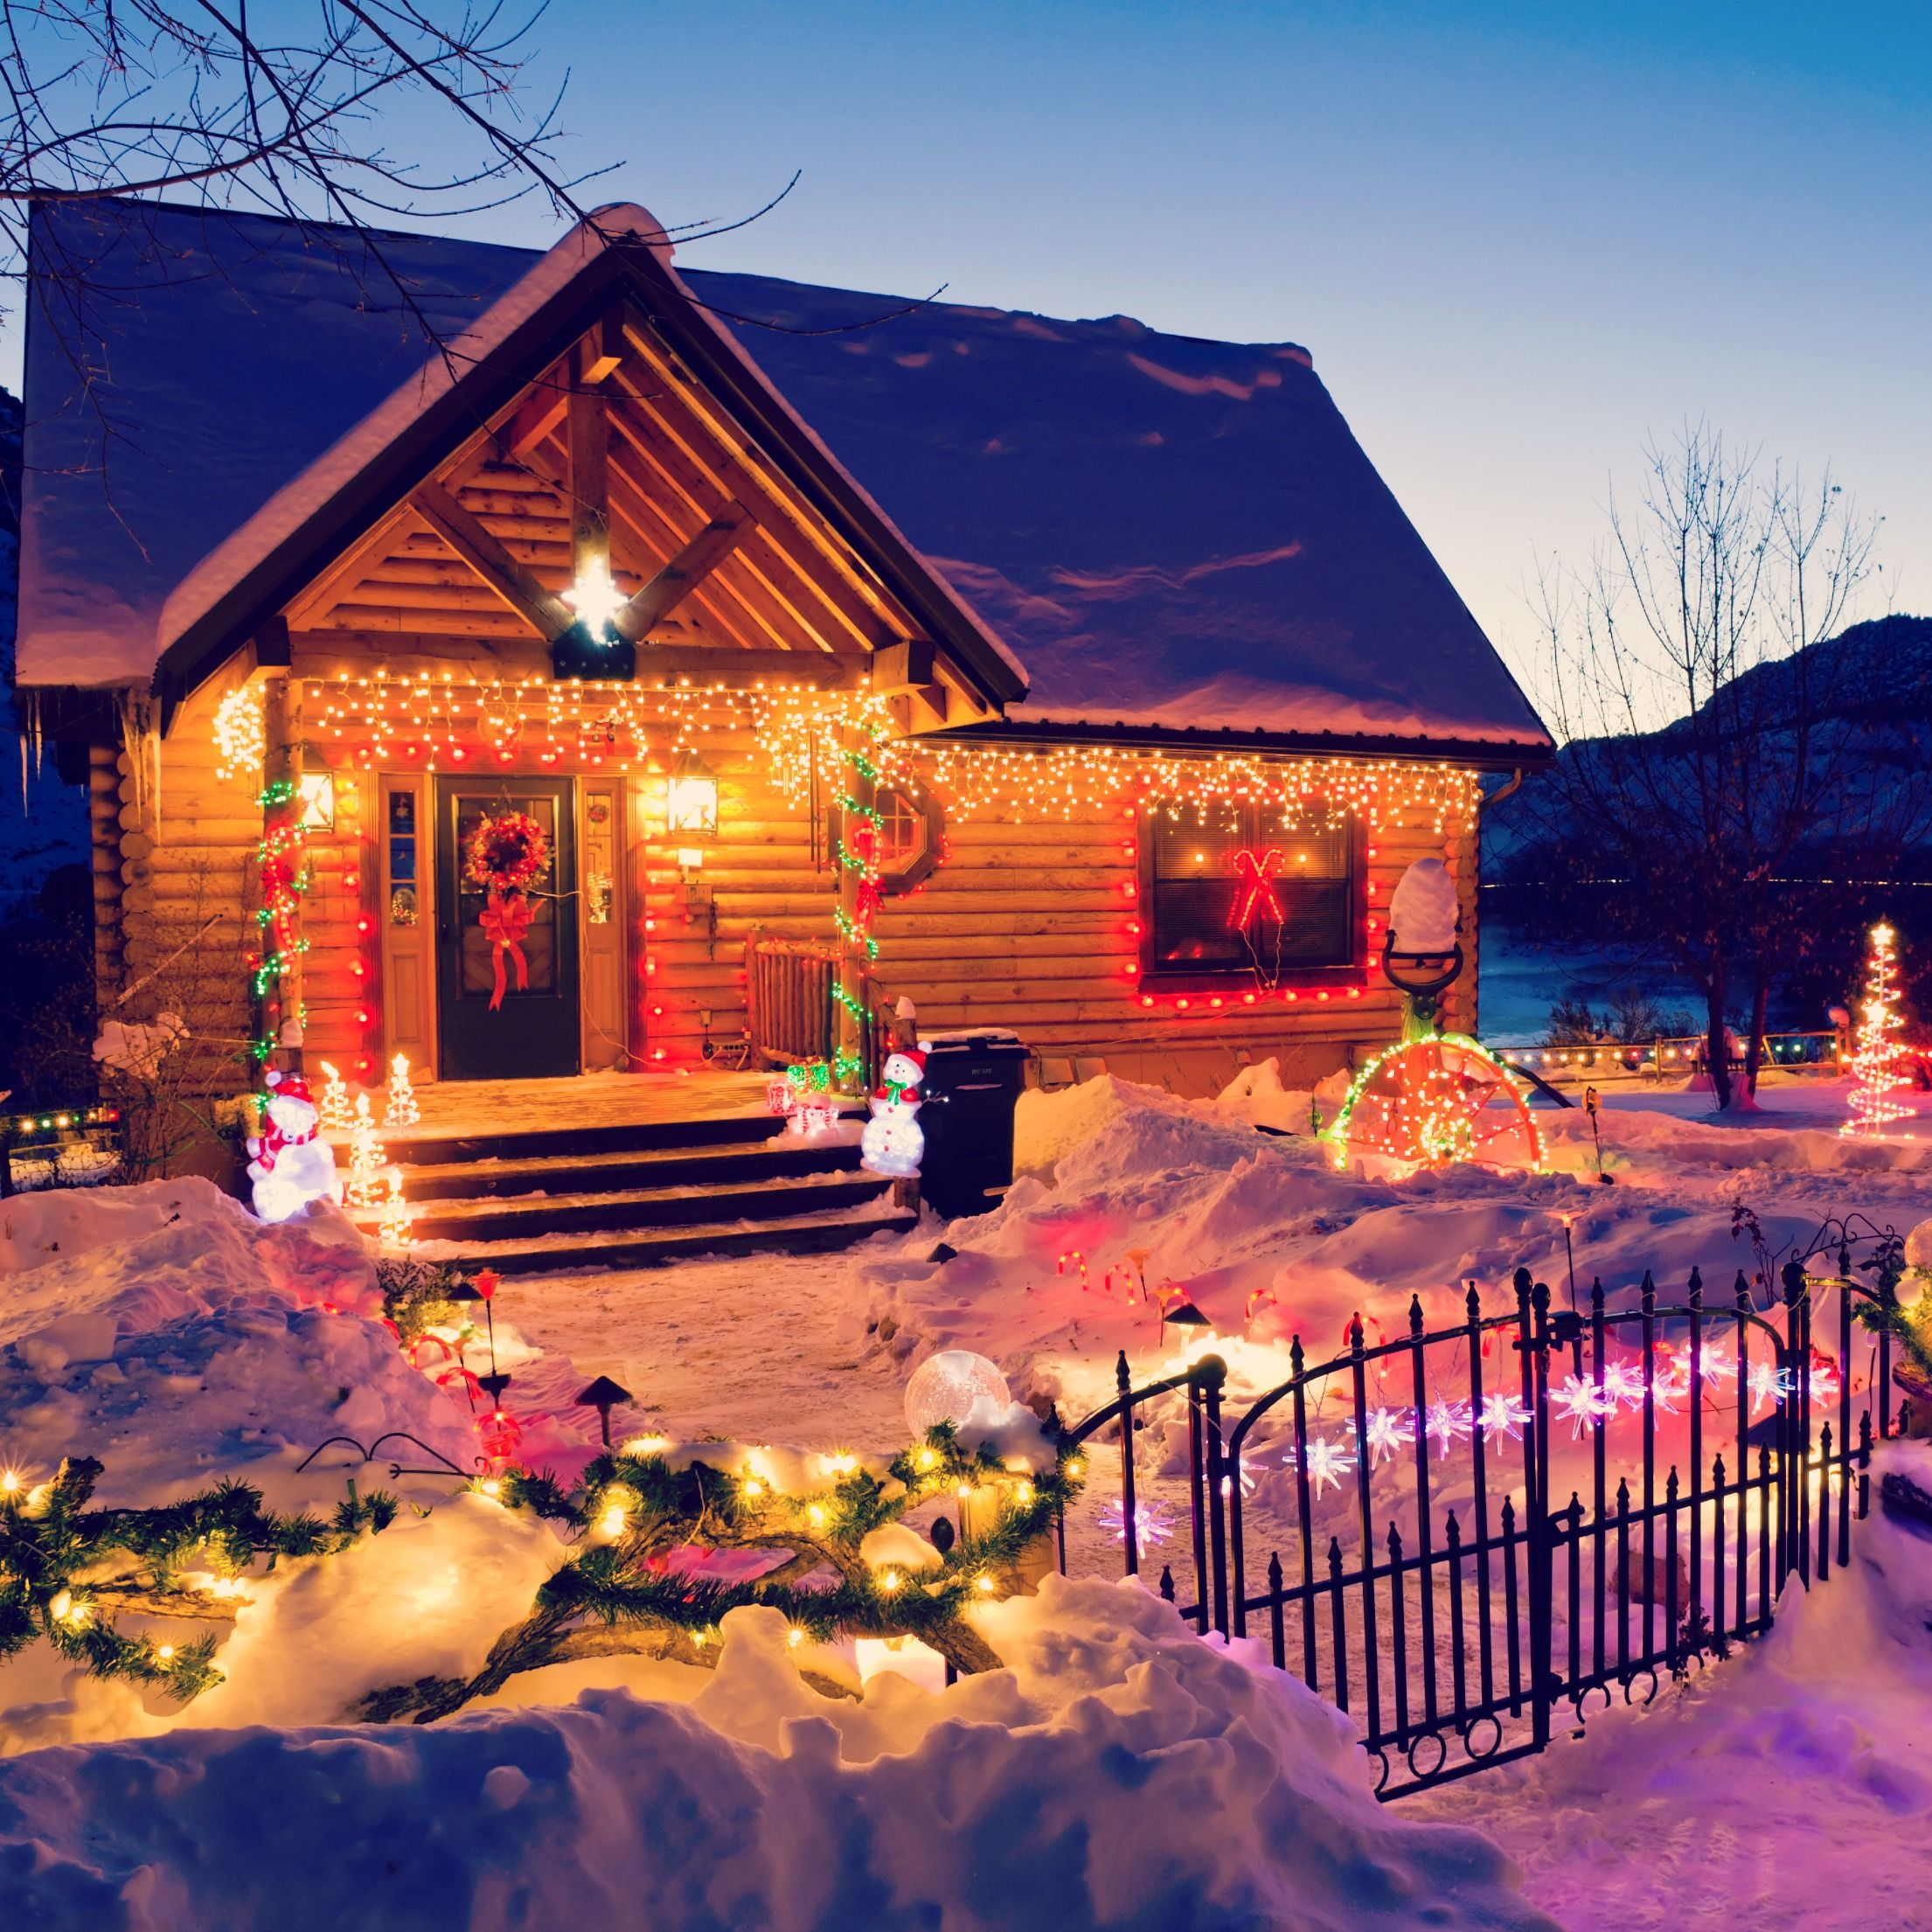 Casa in montagna neve luci di natale house mountains - Casa di montagna ...